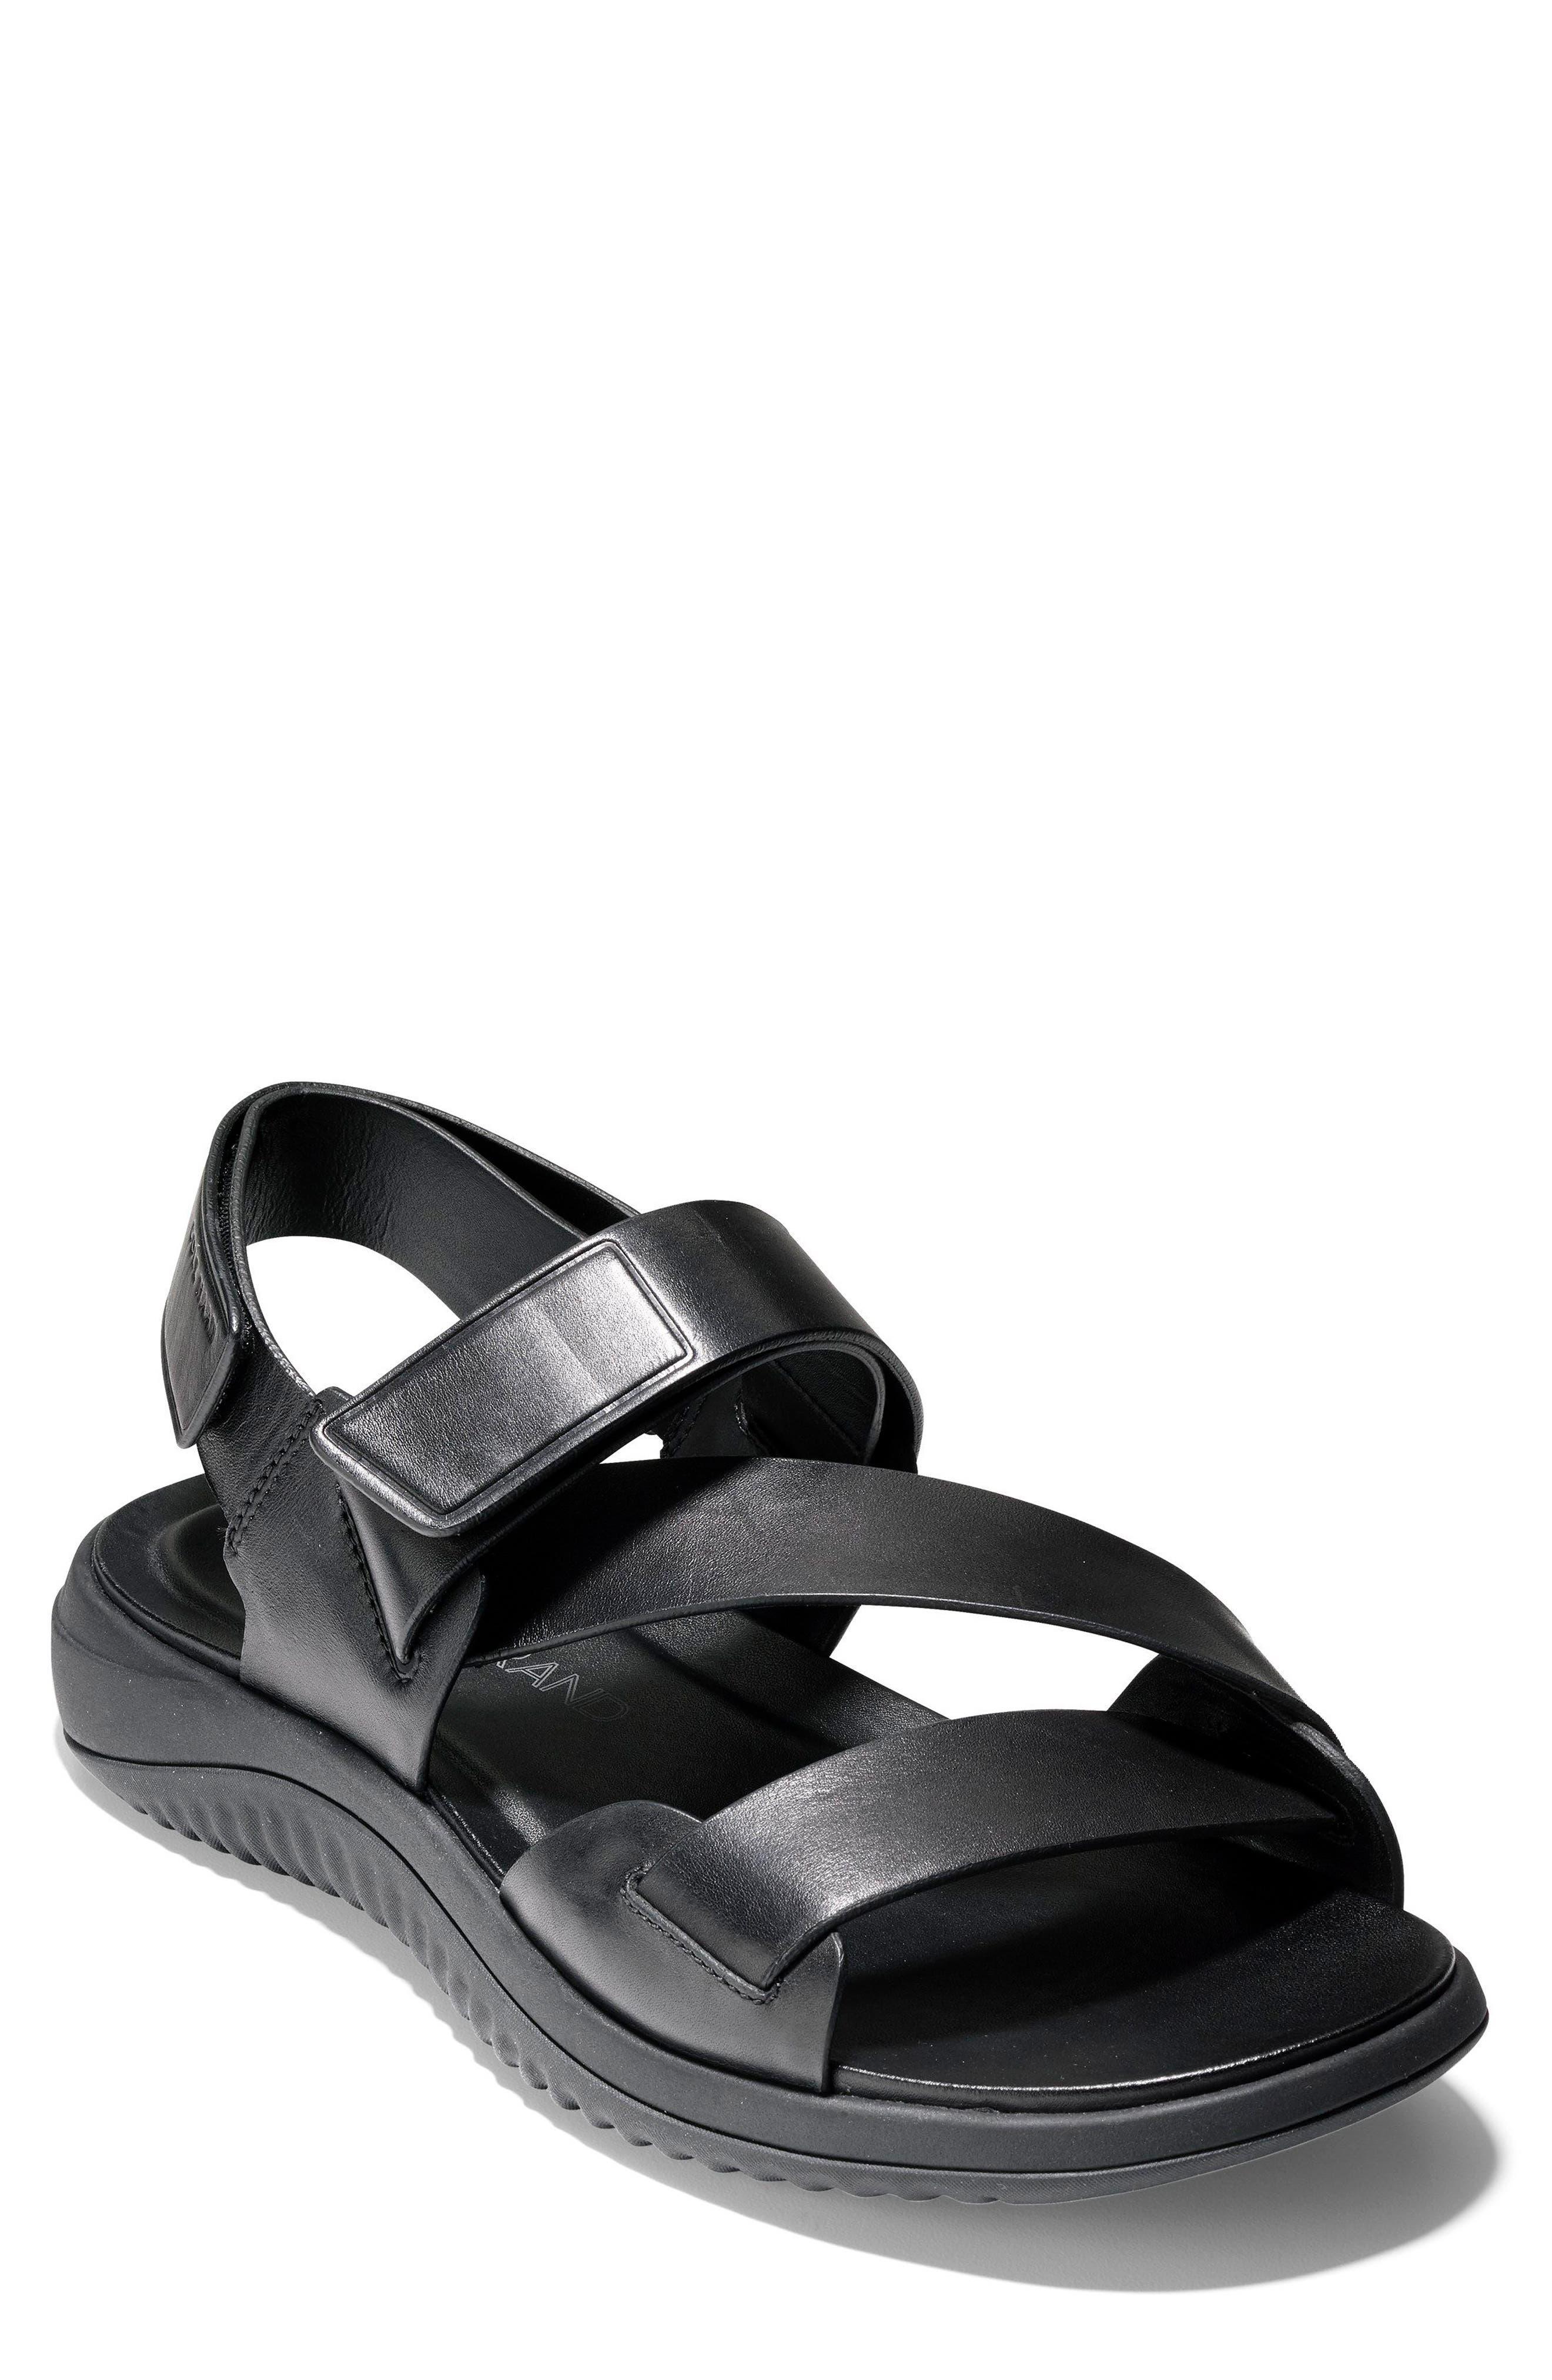 2.ZeroGrand Multistrap Sandal,                             Main thumbnail 1, color,                             003